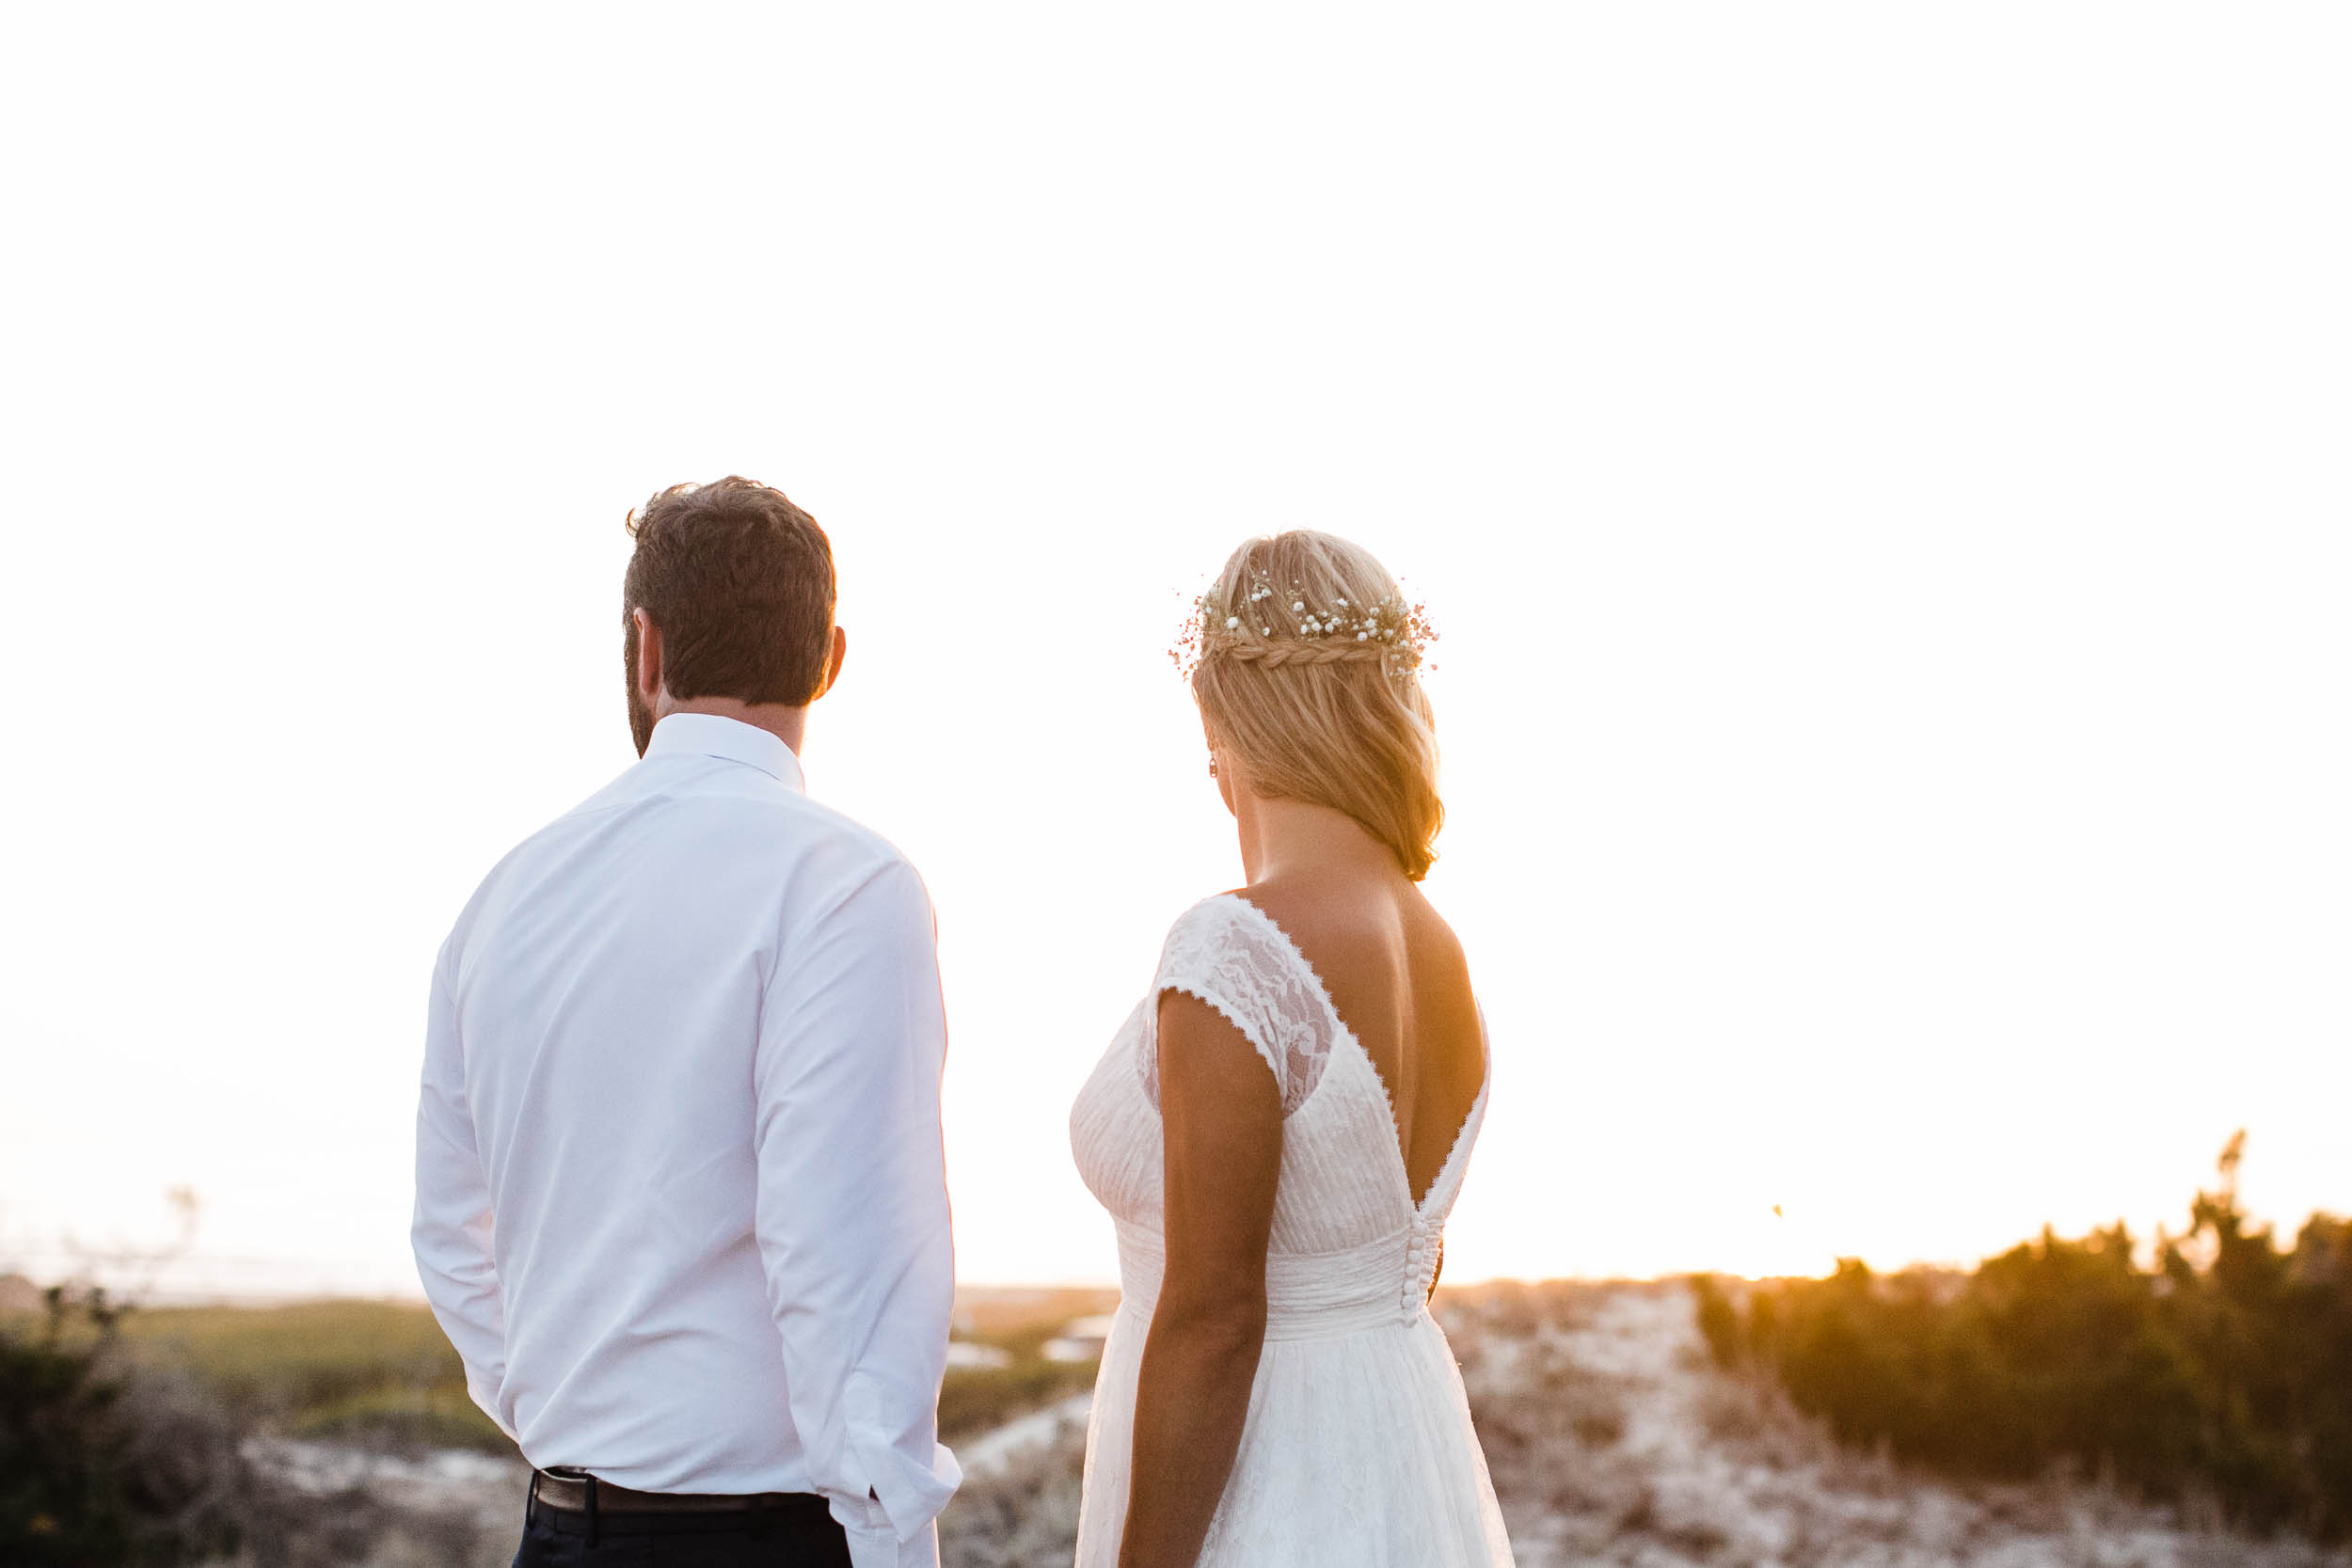 082617_C+K_Asilomar Pacific Grove Wedding_Buena Lane Photography_3101ER.jpg